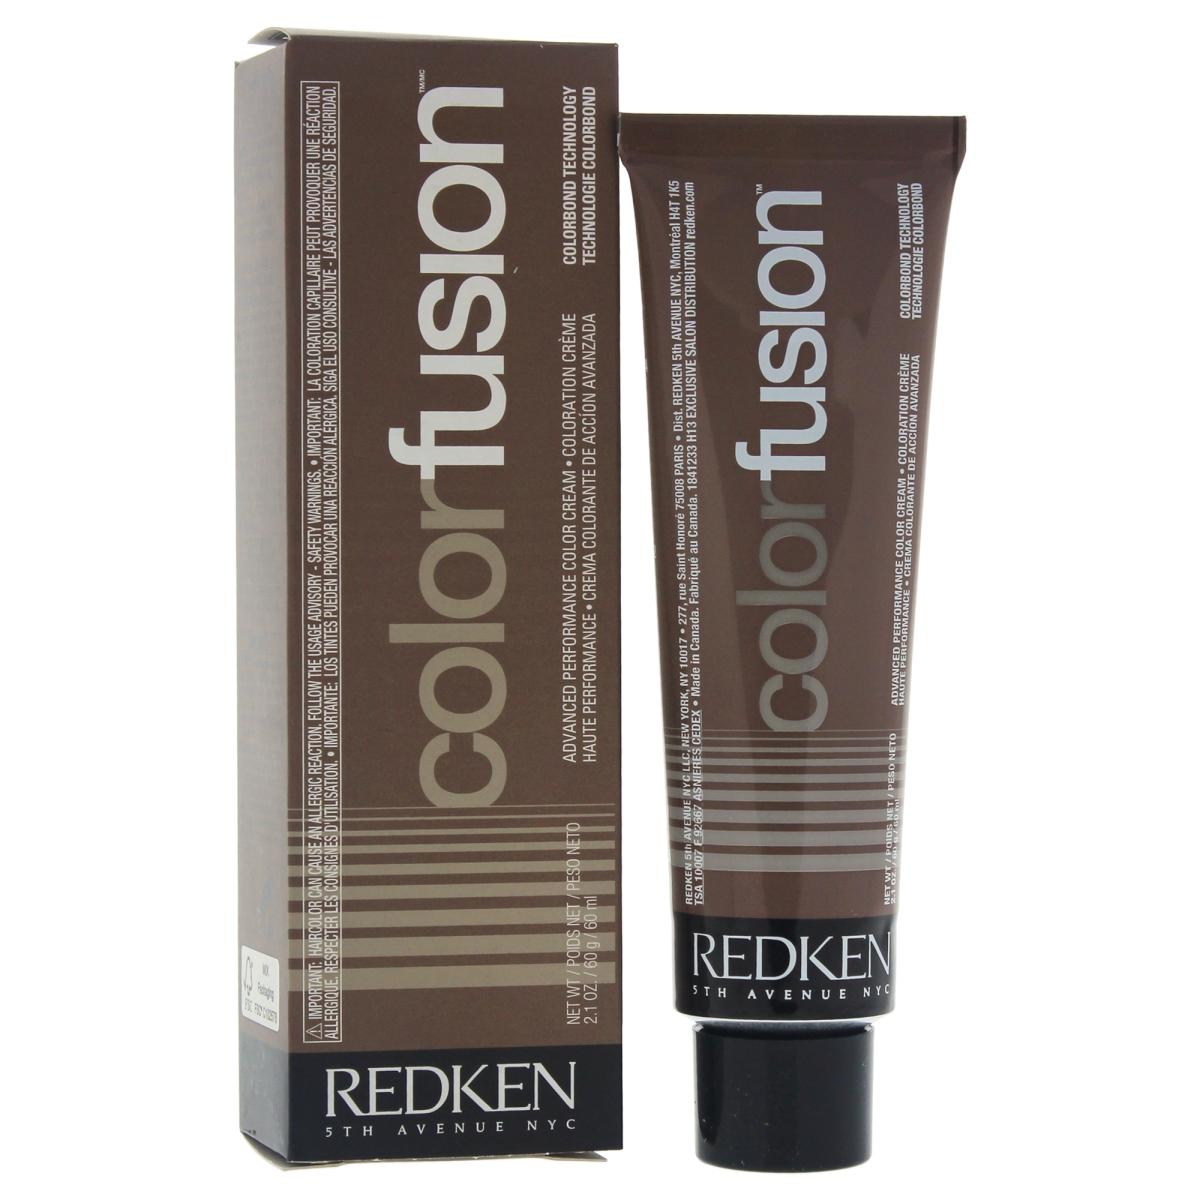 Redken U-HC-11724 2.1 oz Color Fusion Cream No. 3Gb Natural Balance Hair Color for Unisex Gold Beige